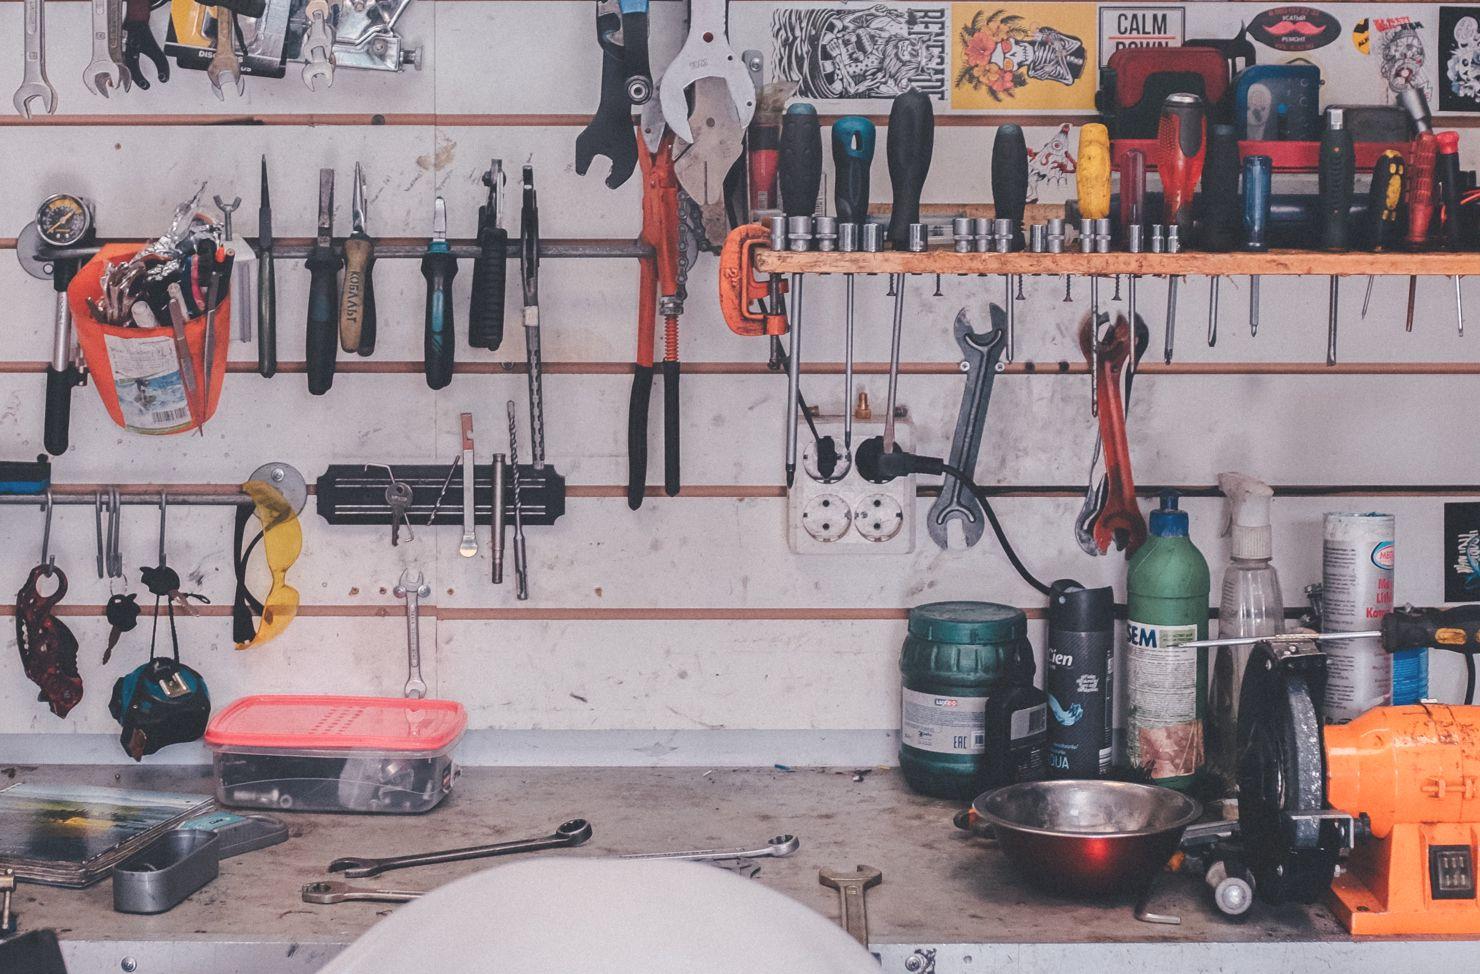 orginised tool shed